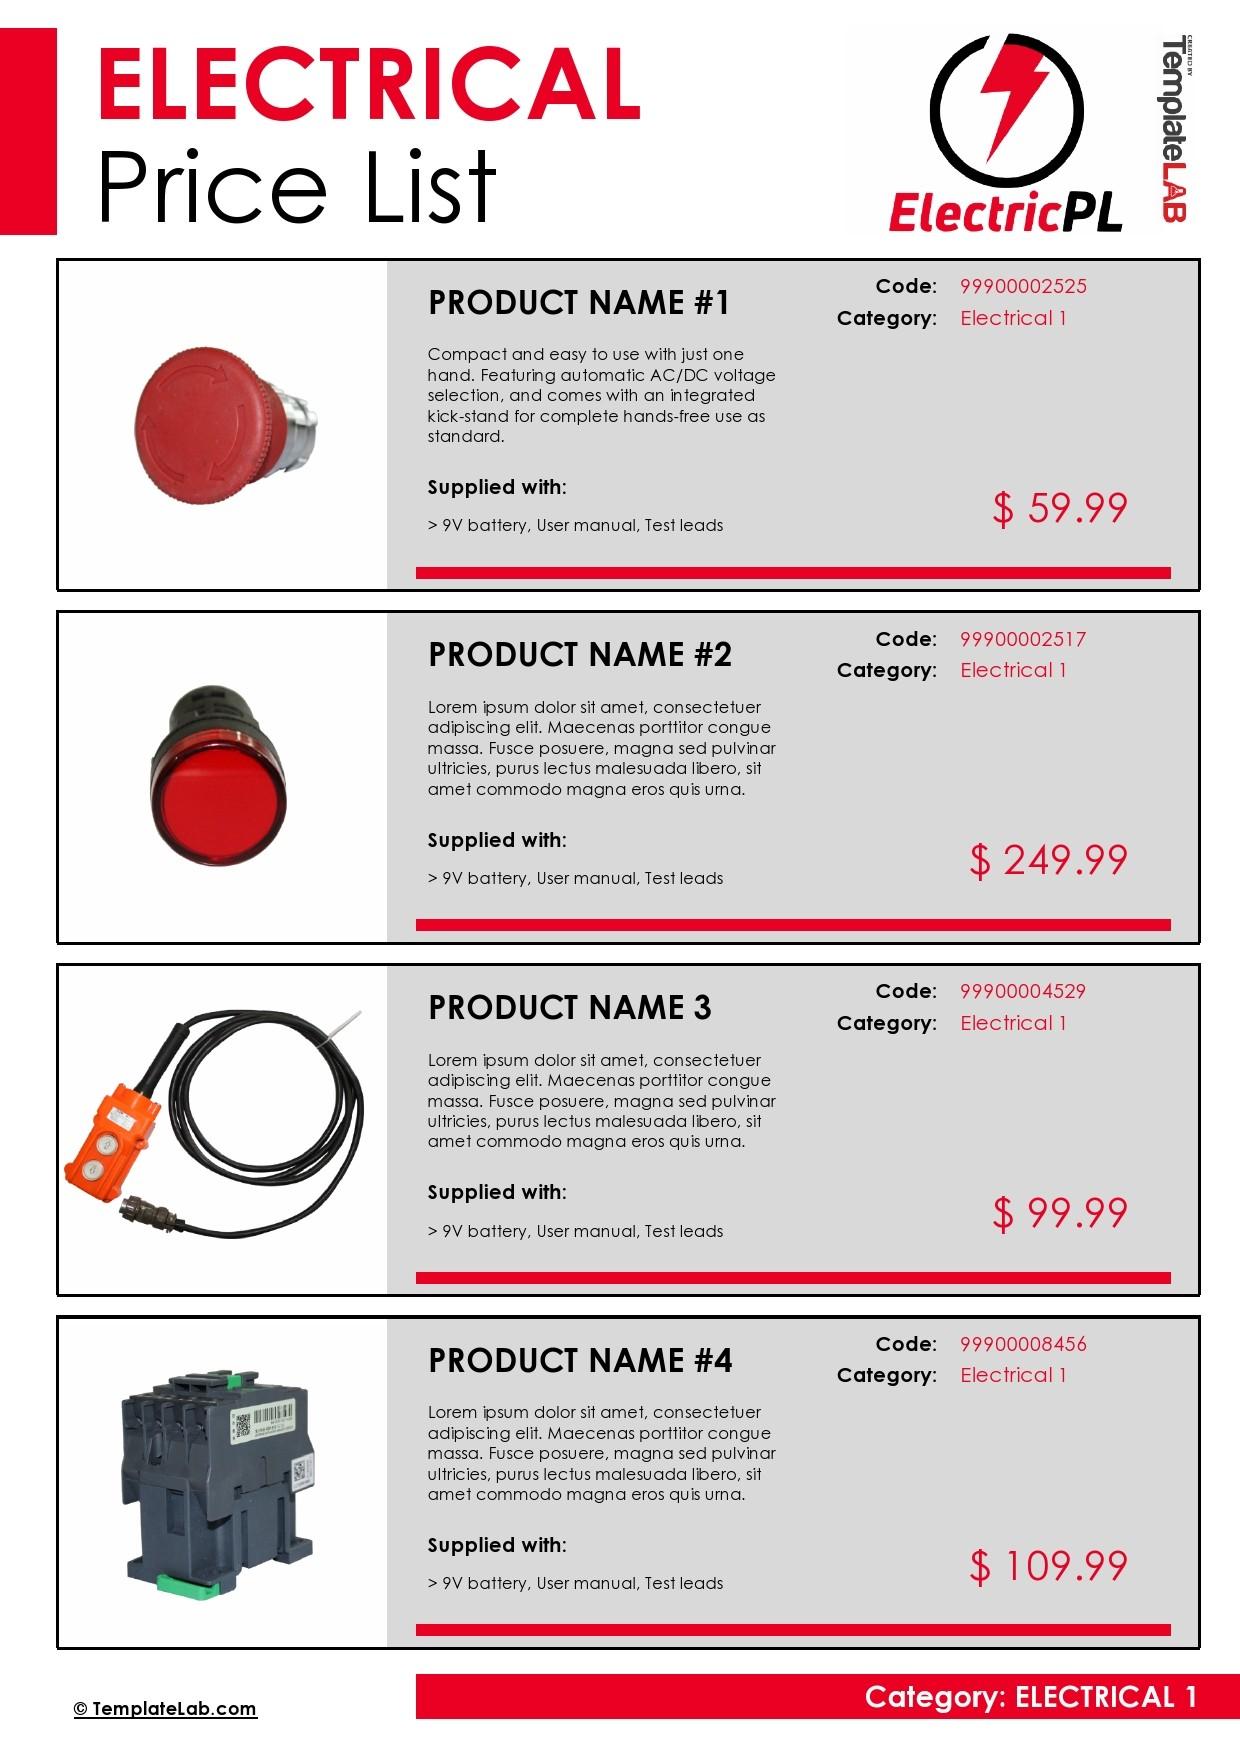 Free Electrical Price List Template - TemplateLab.com